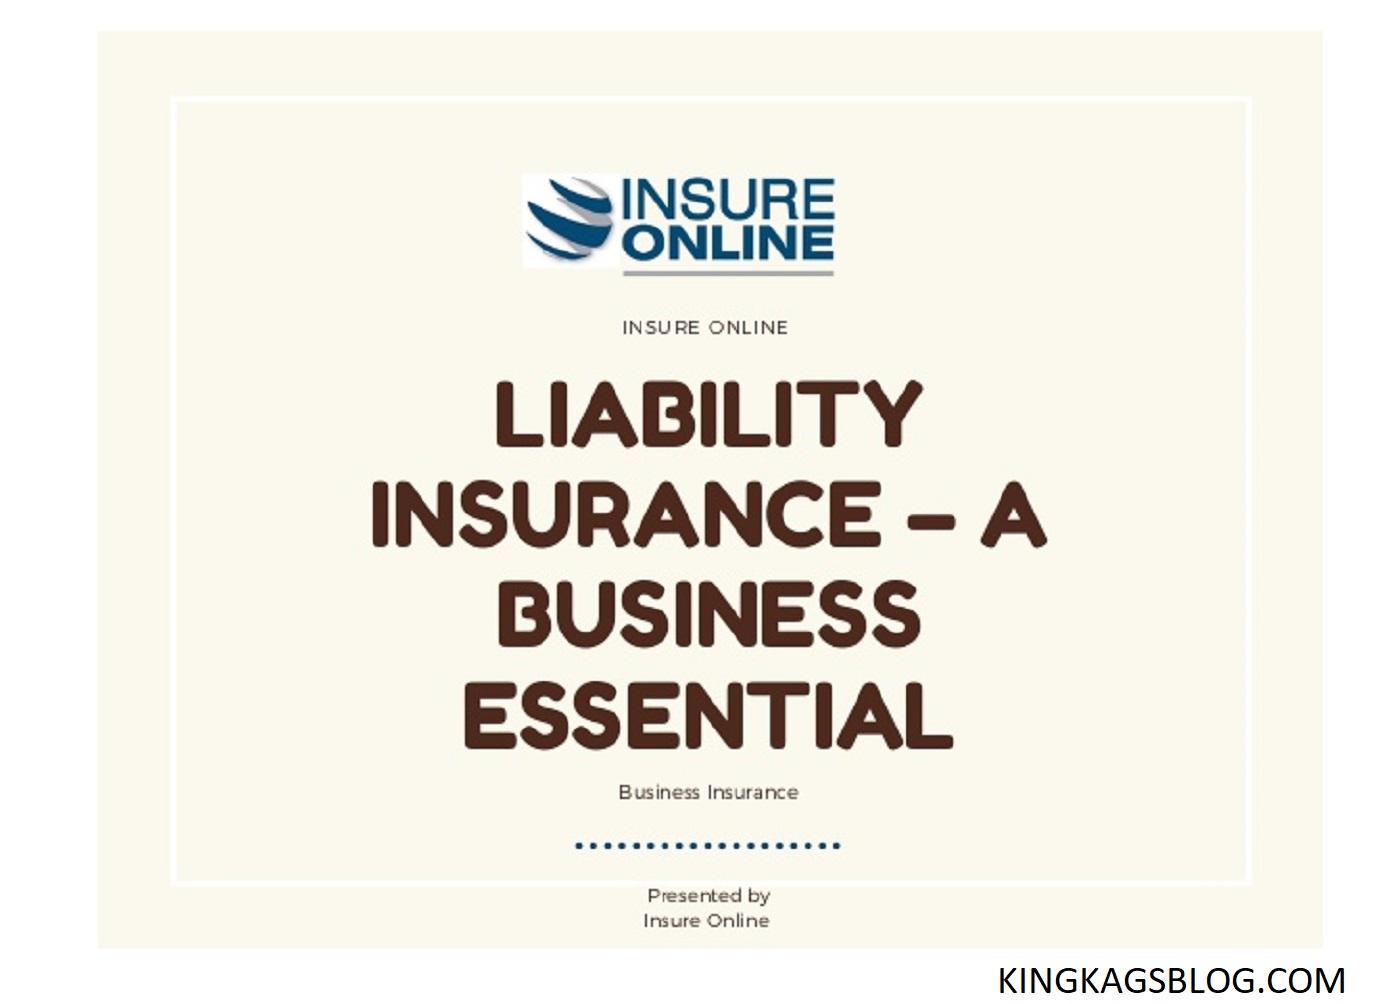 liability-insurance-a-business